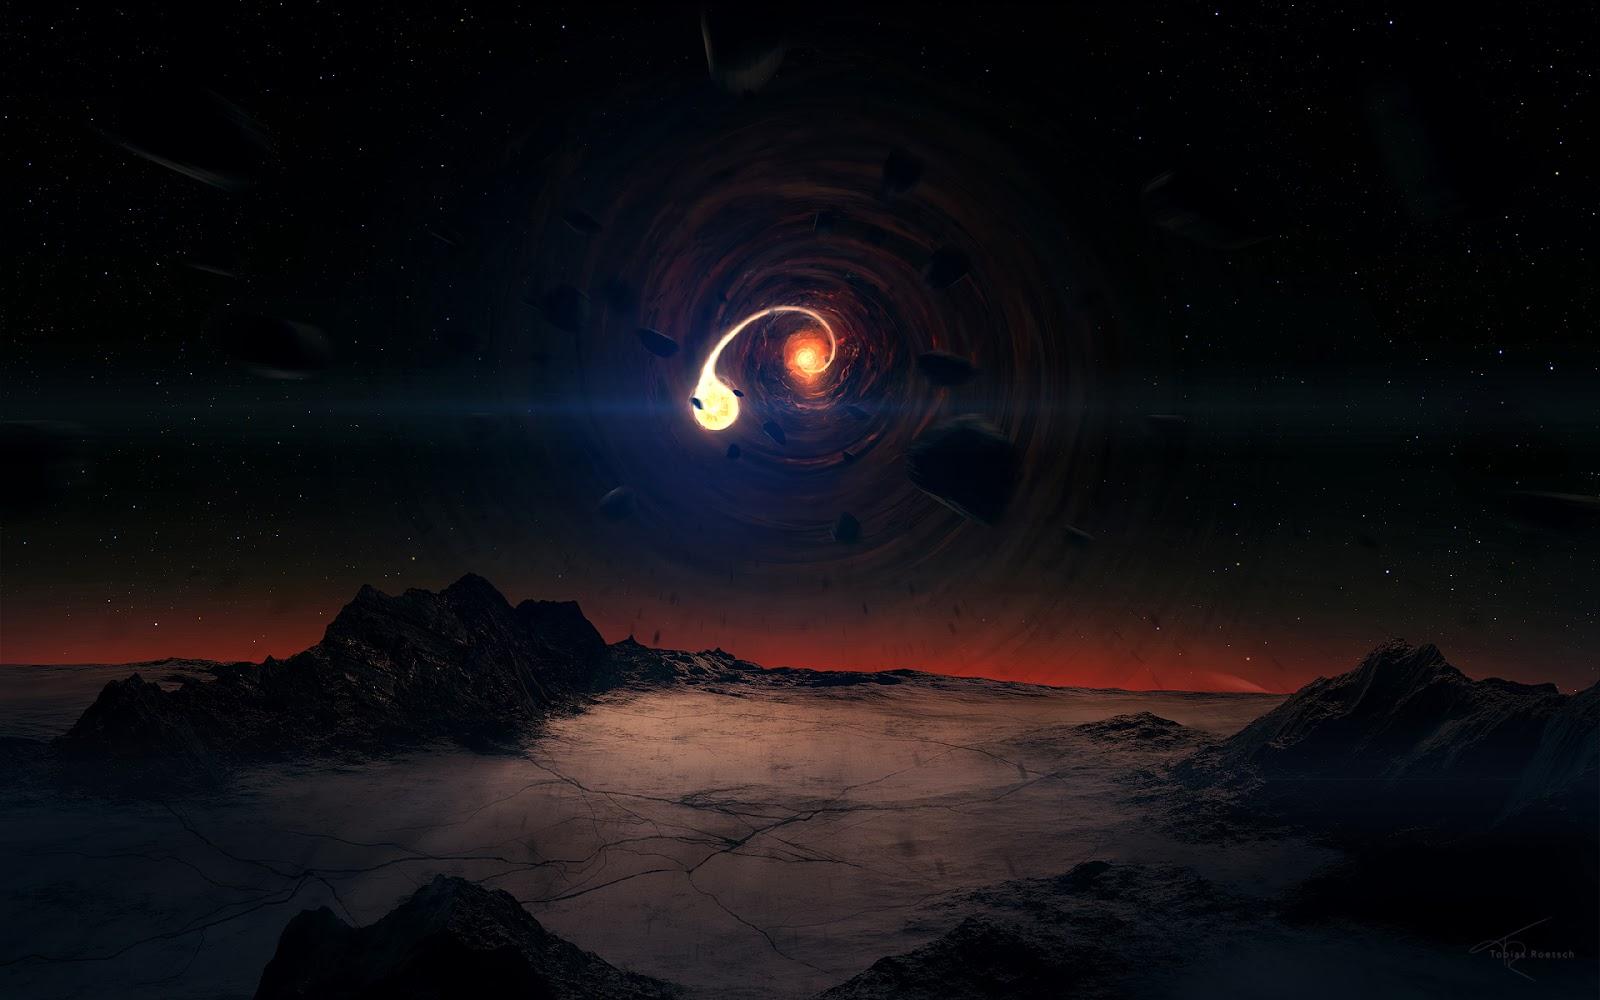 Universul si gaurile negre